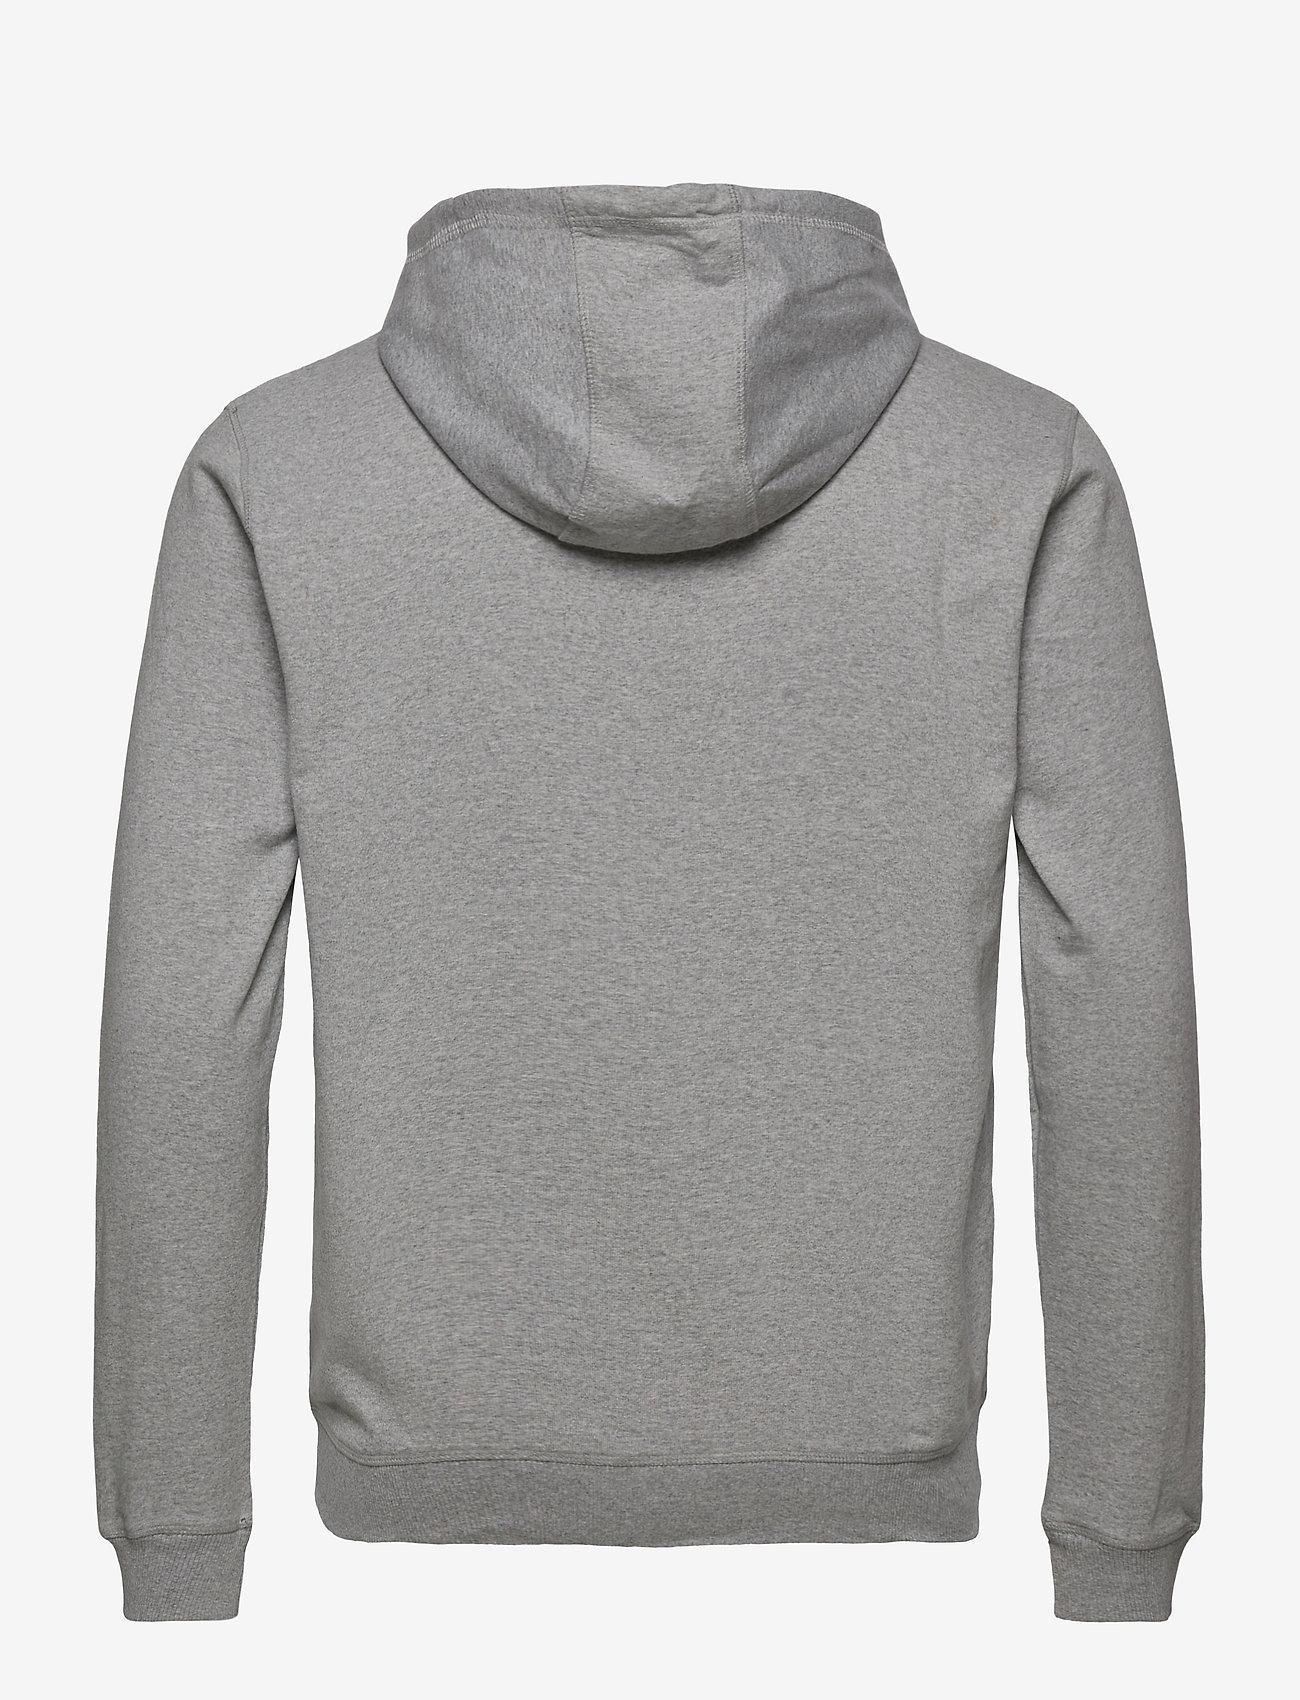 Minimum ville - Sweatshirts LIGHT GREY MELANGE - Menn Klær